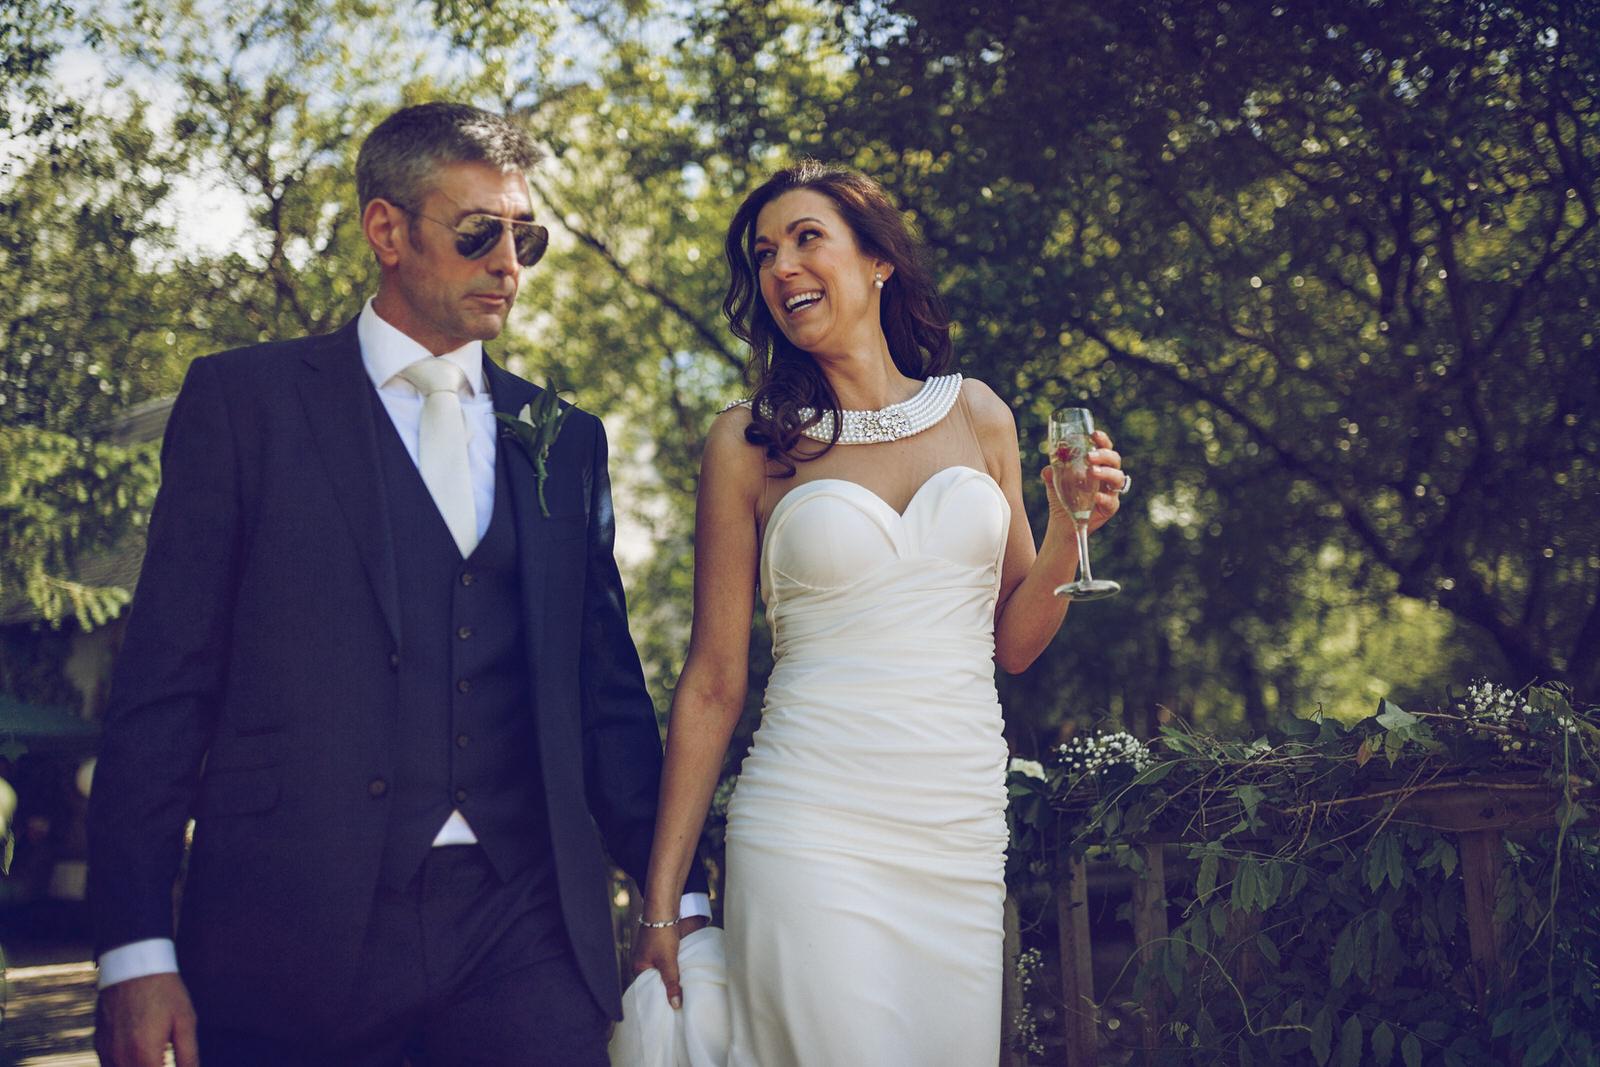 Brooklodge-wicklow-wedding-photographer_108.jpg